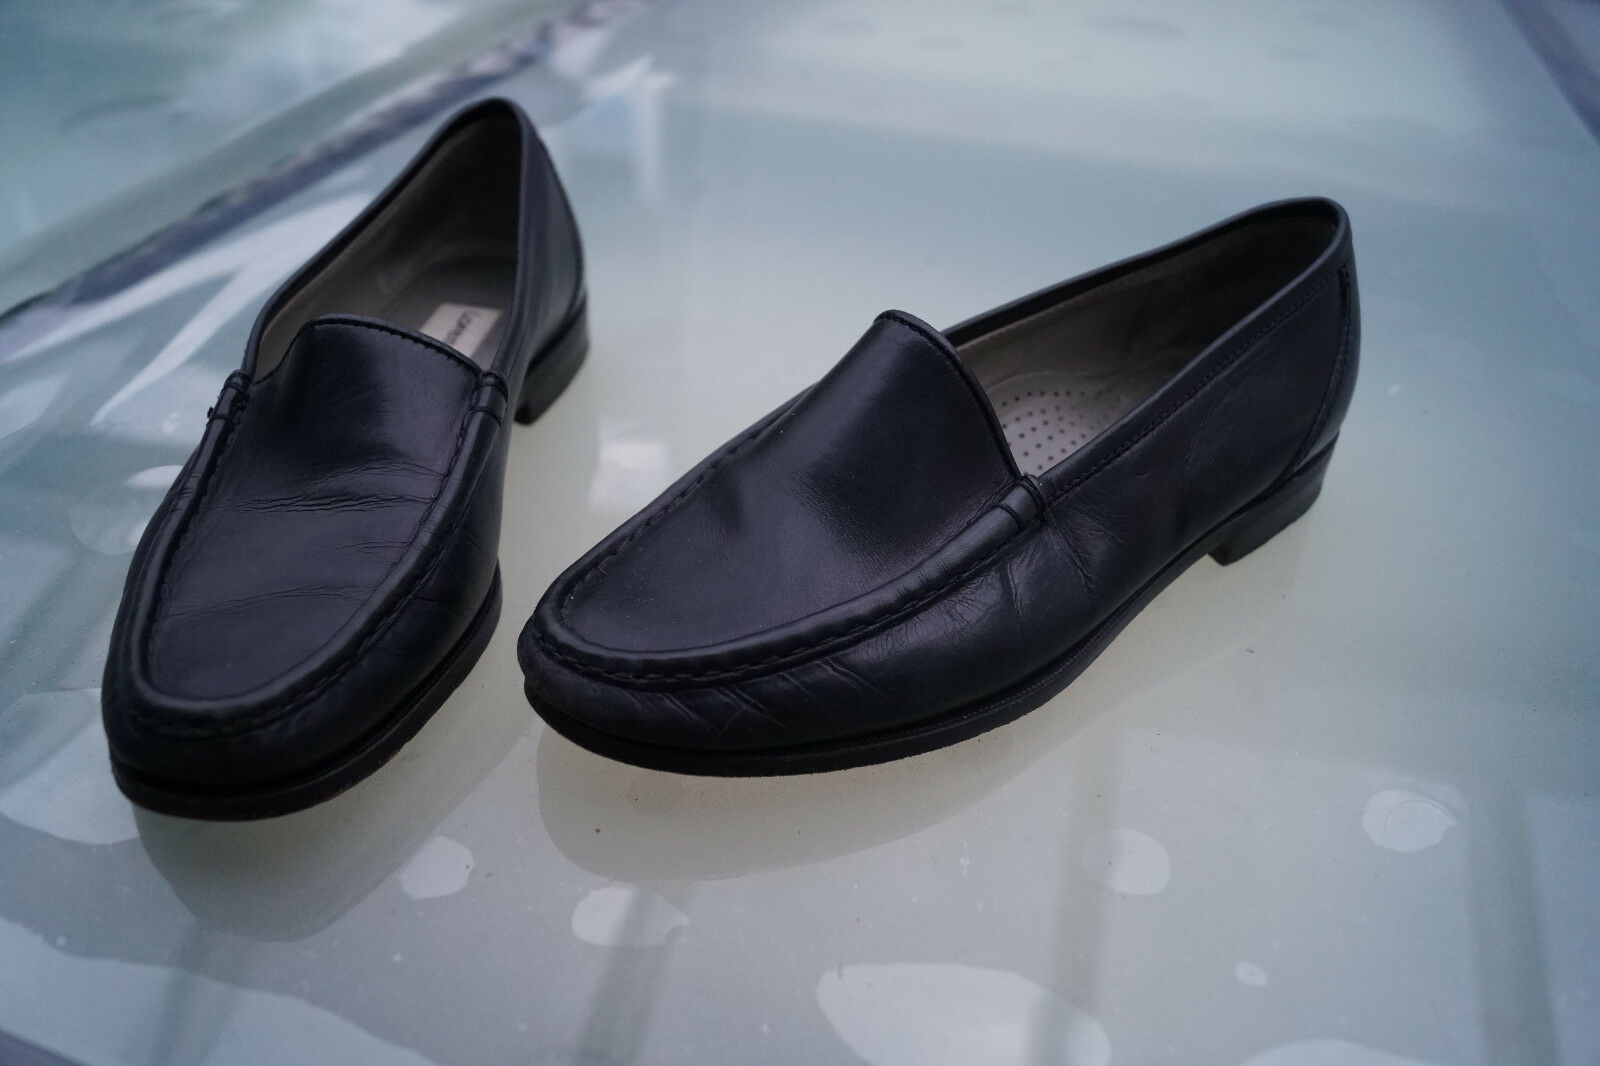 LORENZO BANFI Damen Luxus Schuhe Leder Mokassins Slipper Gr.37 schwarz Leder Schuhe TOP #2k 38b256